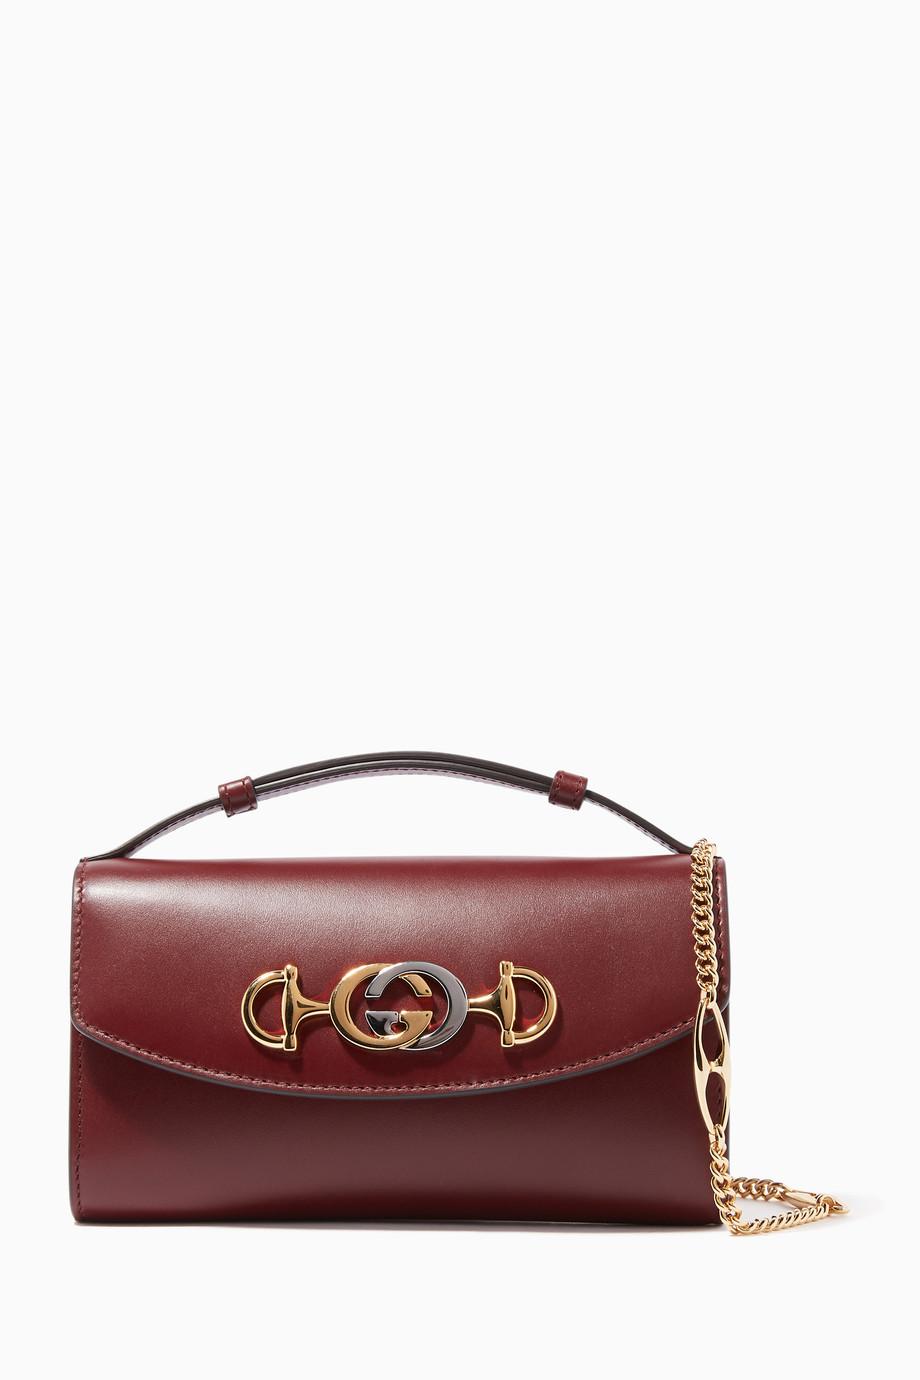 a91a0808a Shop Gucci Burgundy Zumi Mini Leather Cross-Body Bag for Women ...